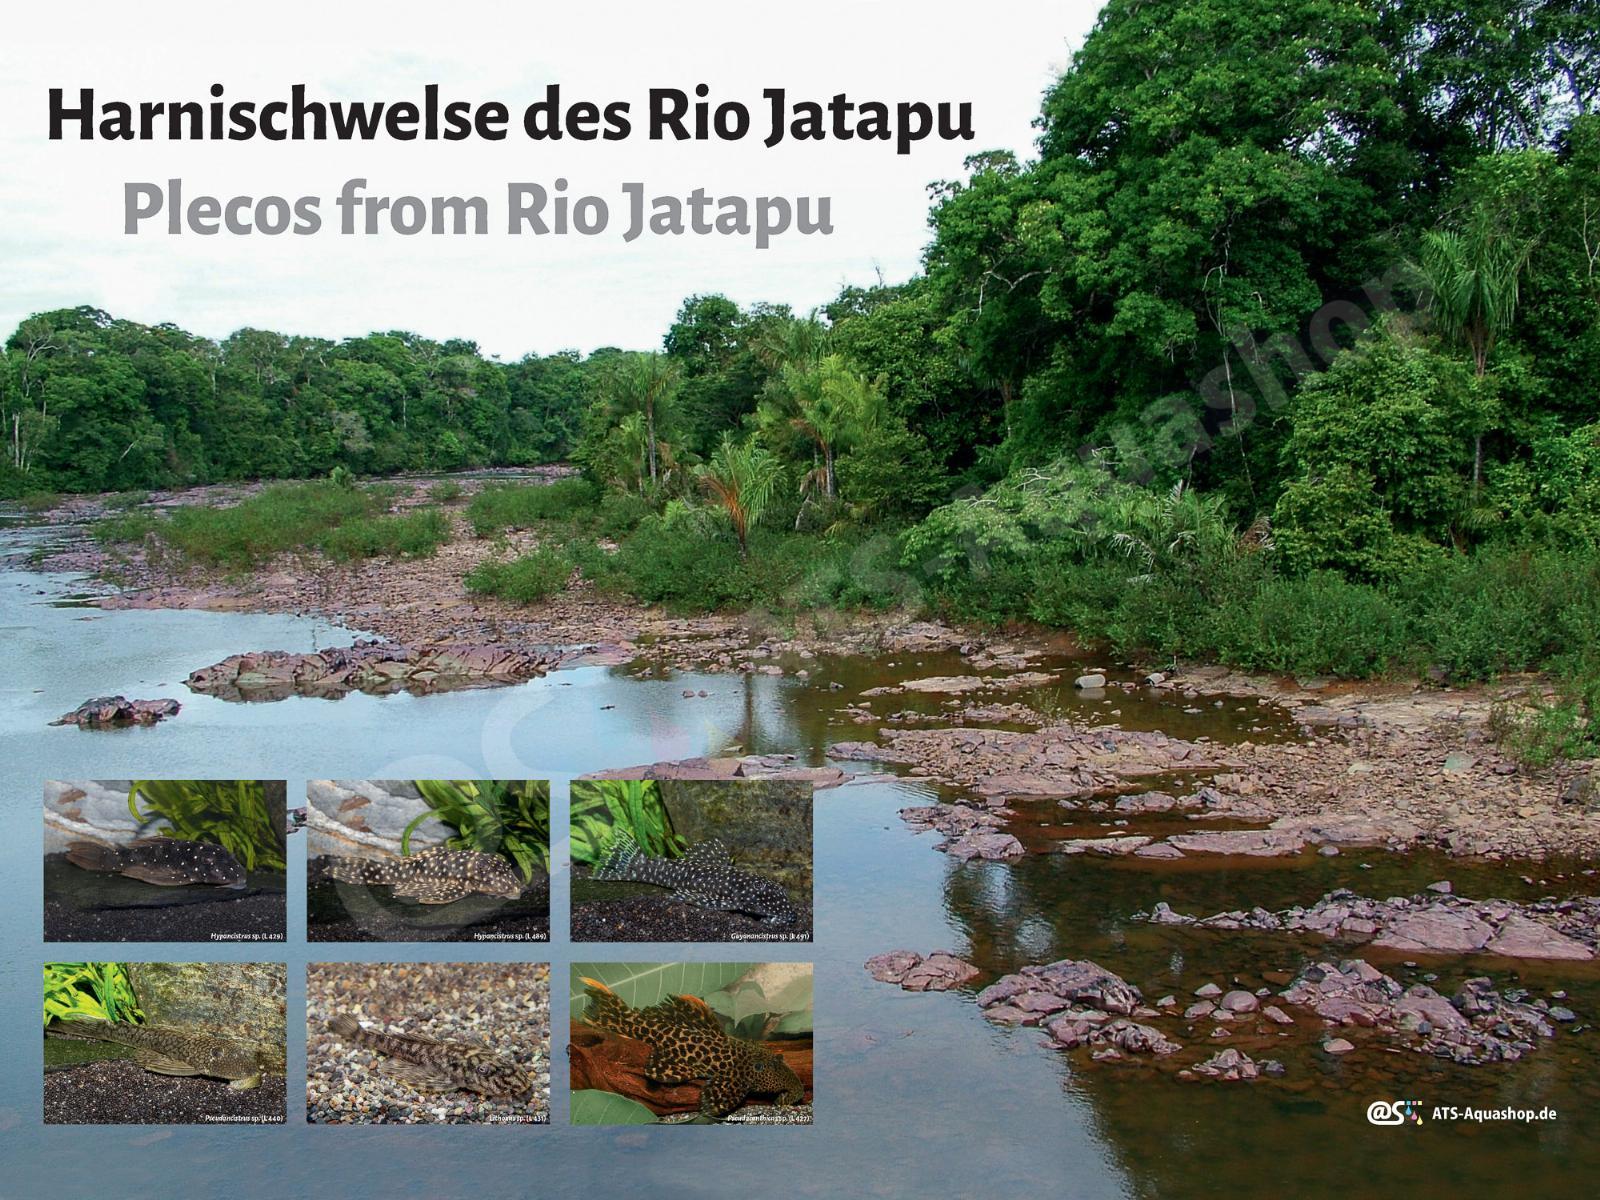 harnischwelse des rio jatapu 2